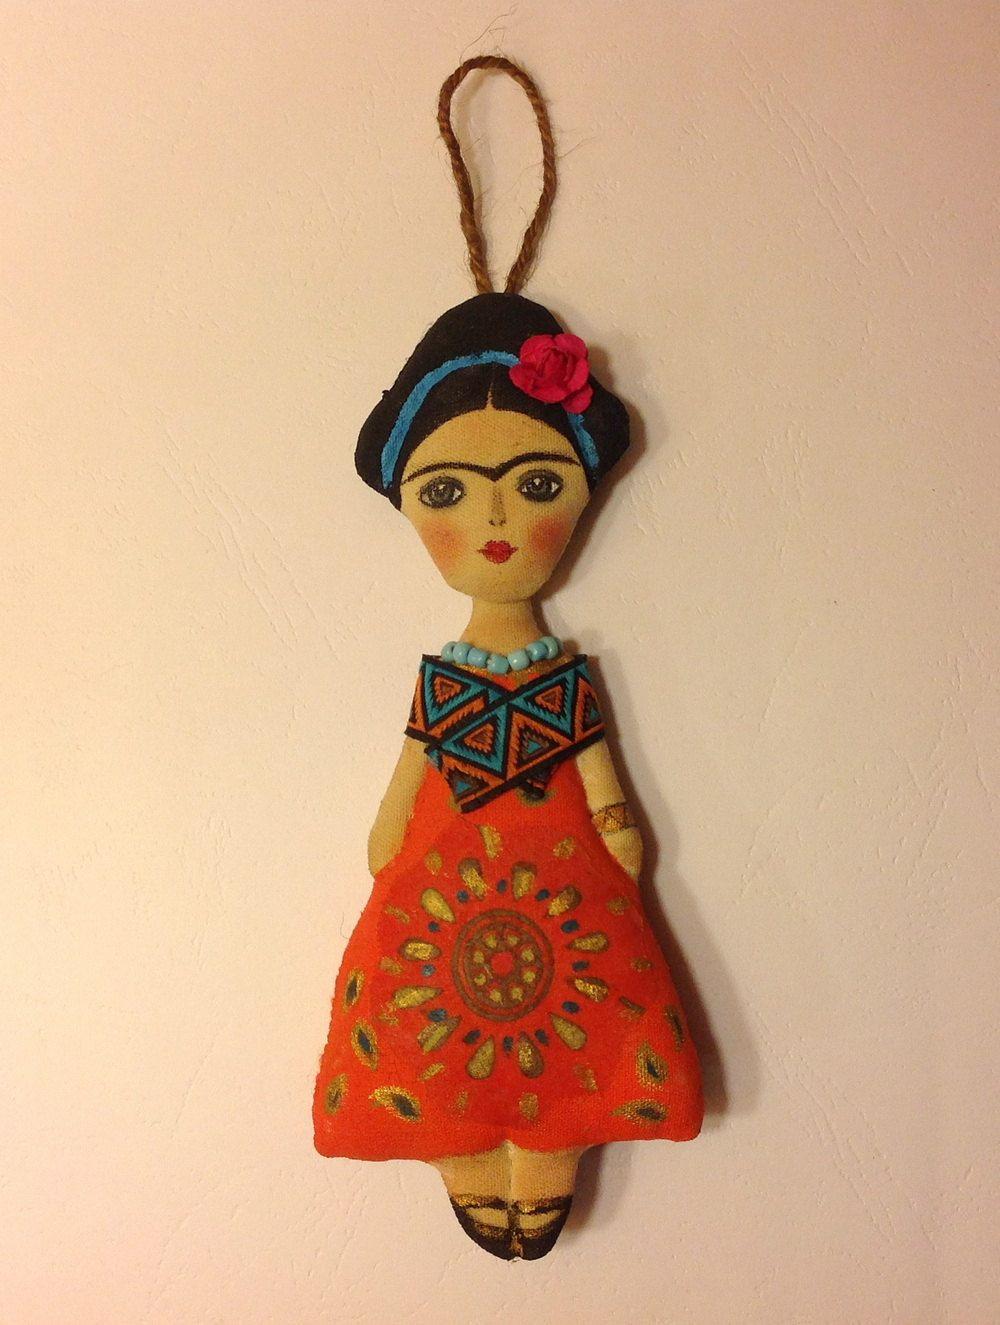 Dolls handcrafted-Art doll Frida-Fabric doll-Diego Rivera-Frida Kahlo-Frida doll-Human figure doll-Frida-Mexican art doll-Mexican painter (40.00 USD) by NatashaArtDolls